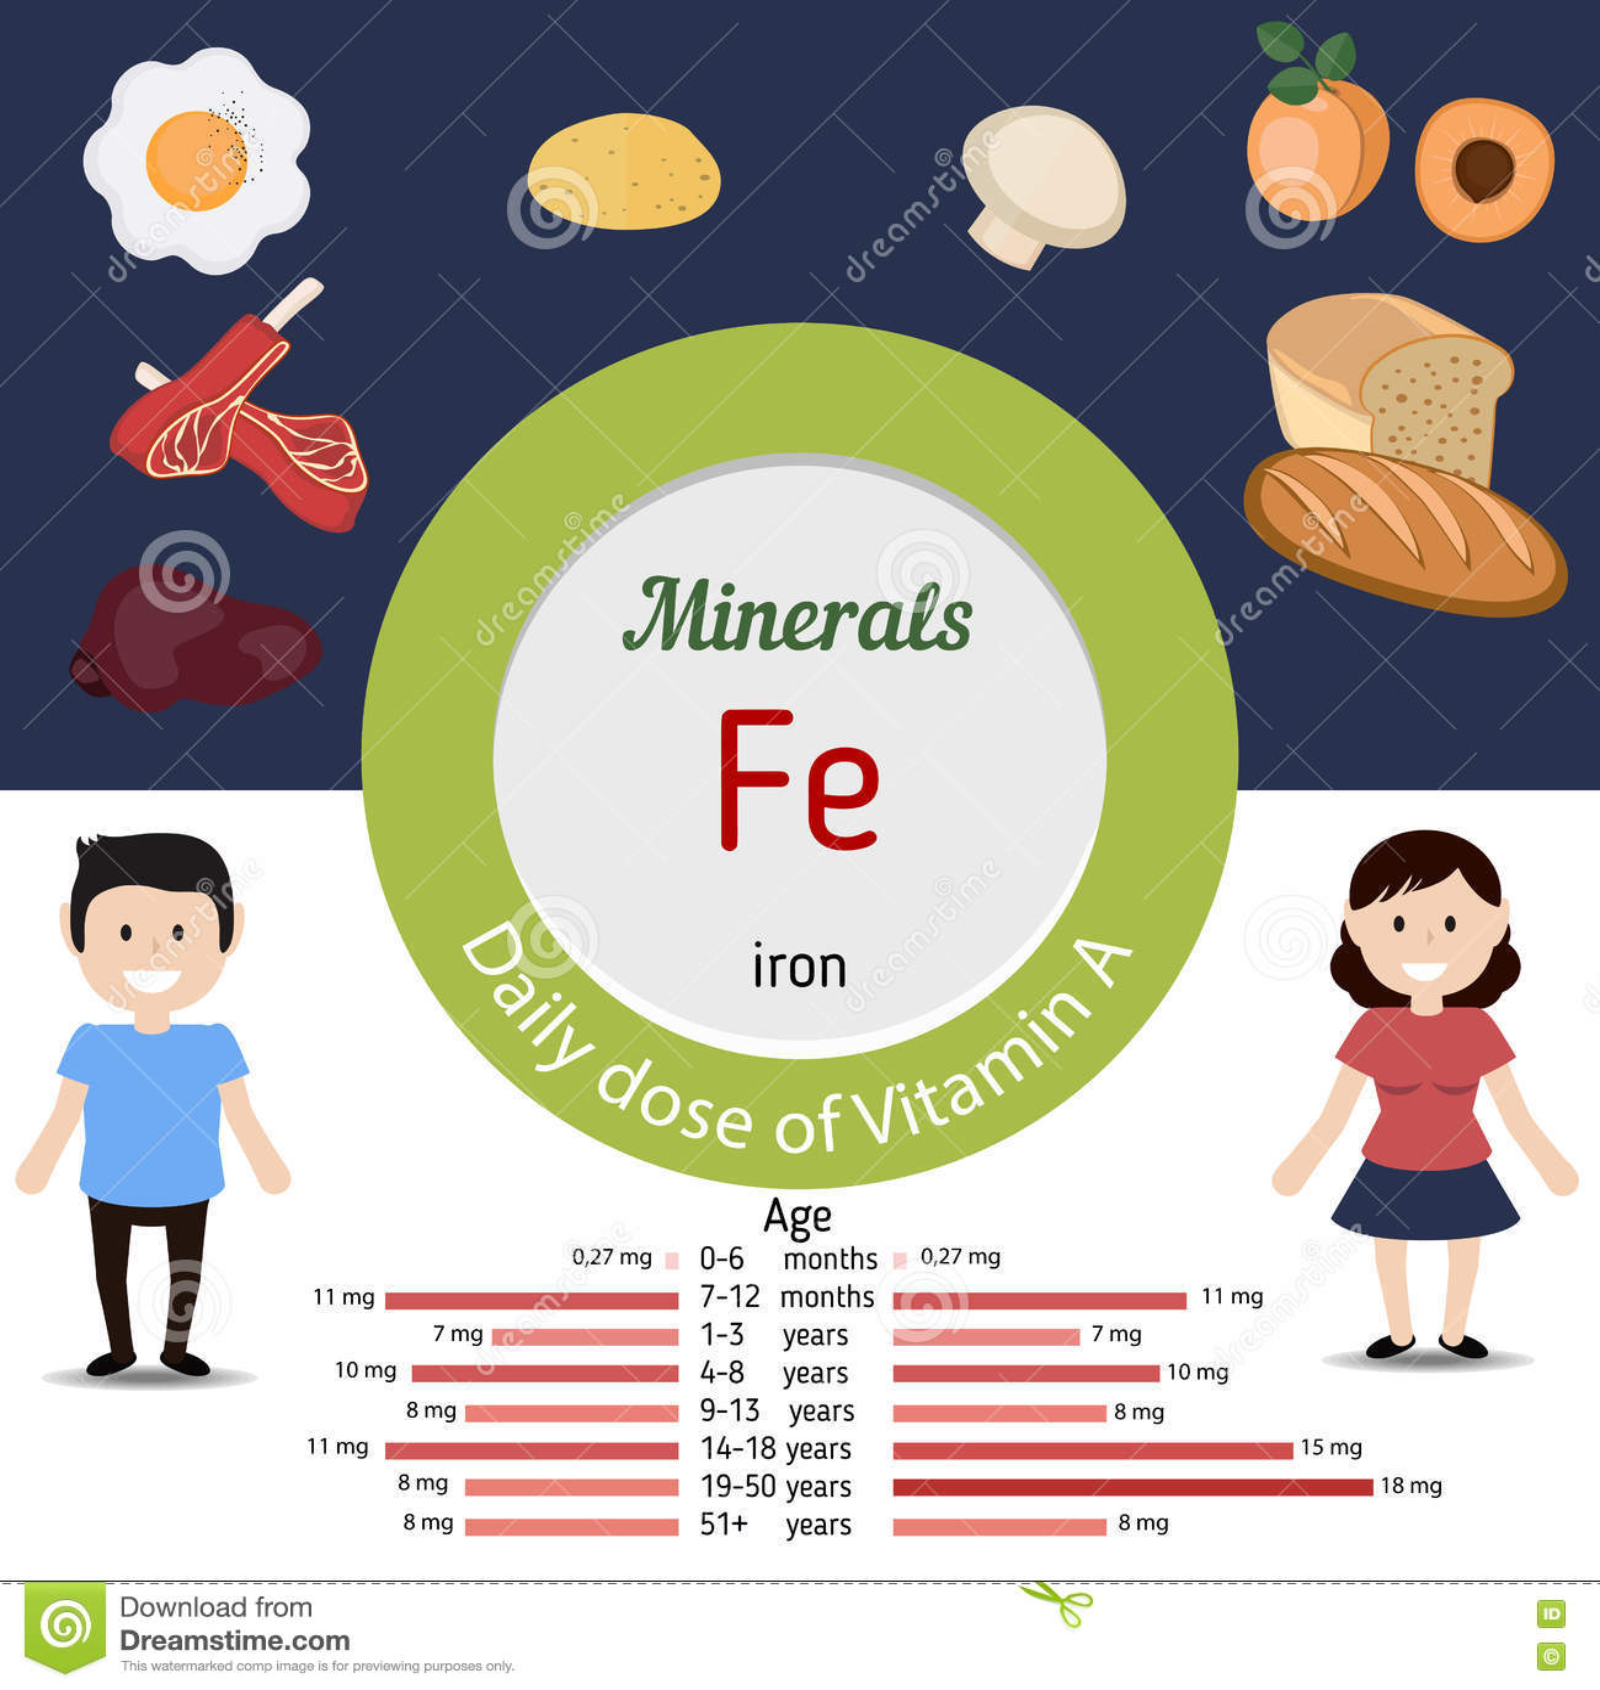 FE de los minerales infographic